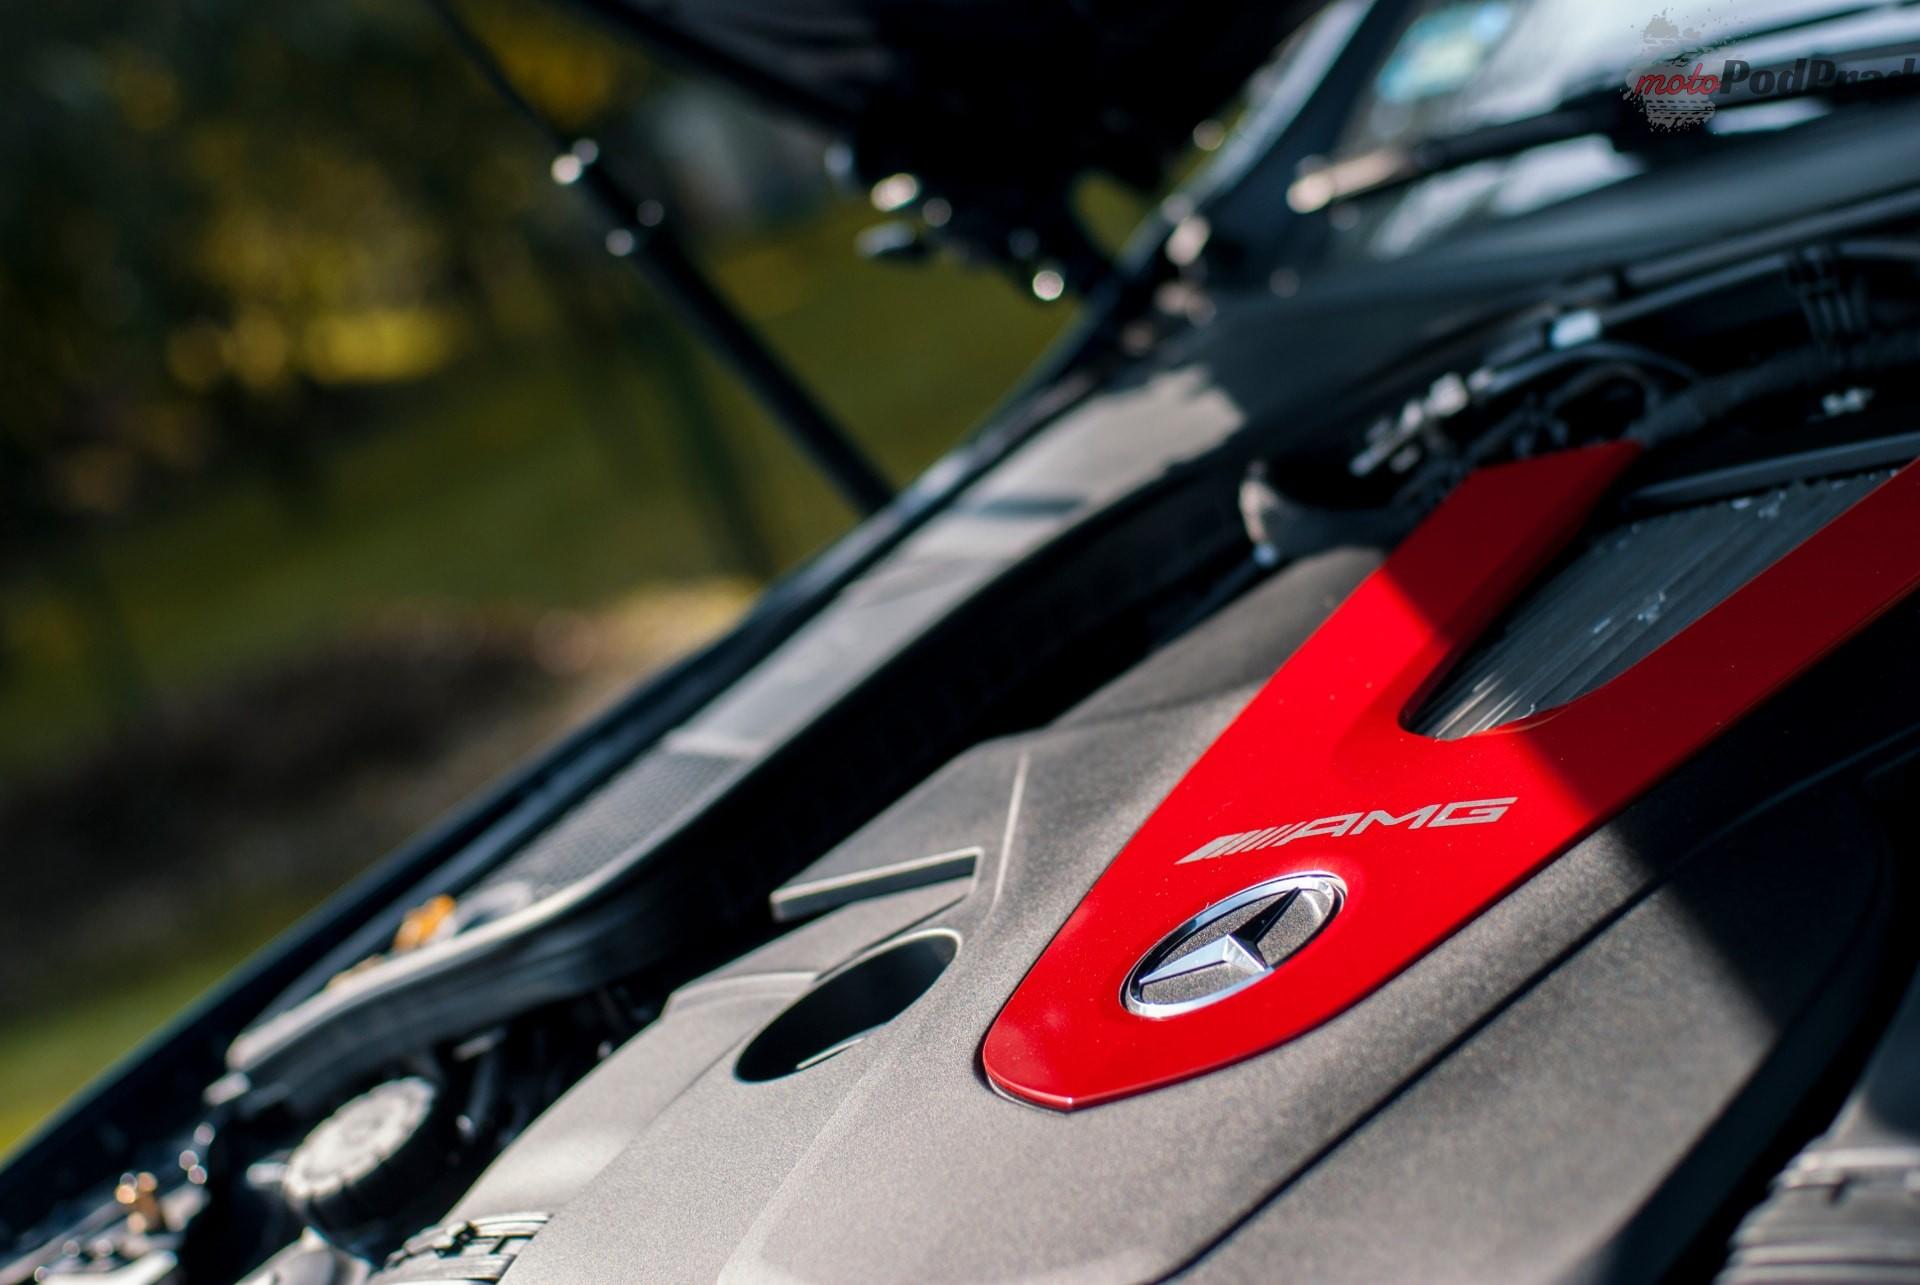 mercedes amg c43 cabrio 18 Minitest: Mercedes AMG C 43 Cabrio   Ostatnie promienie słońca